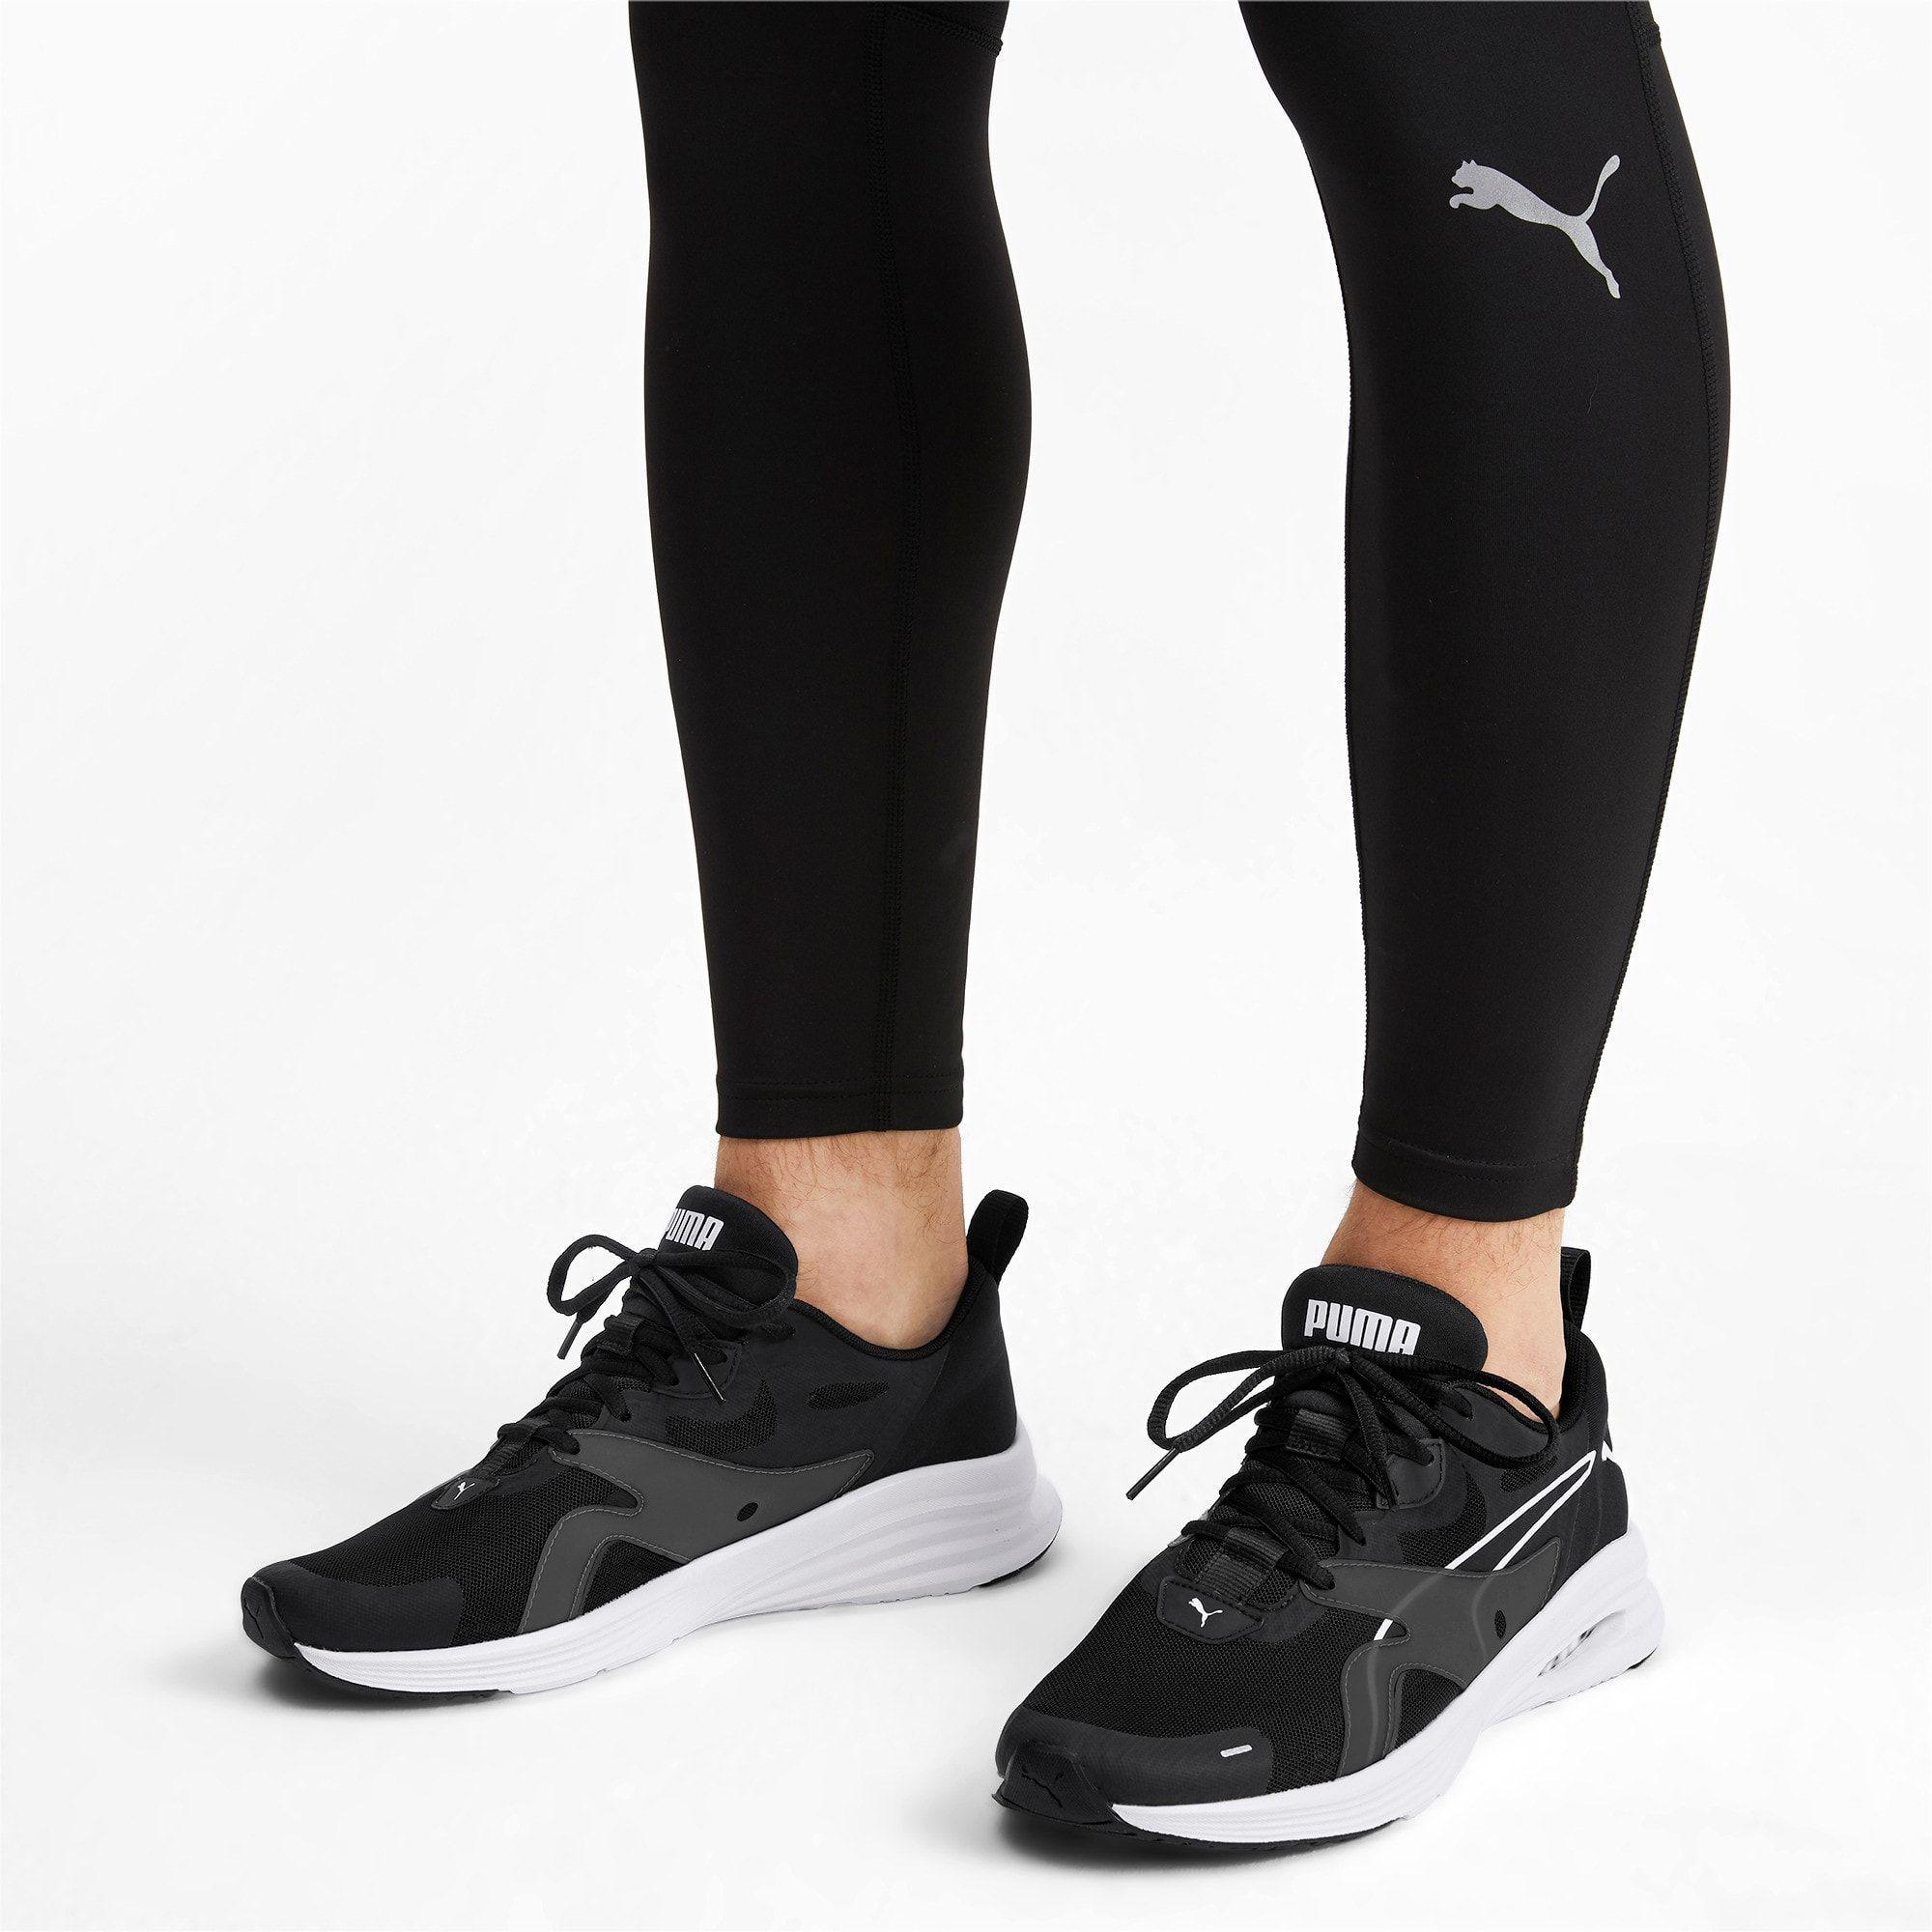 PUMA Hybrid Fuego Men's Running Shoes in Black/White size 10.5 #stylishmen